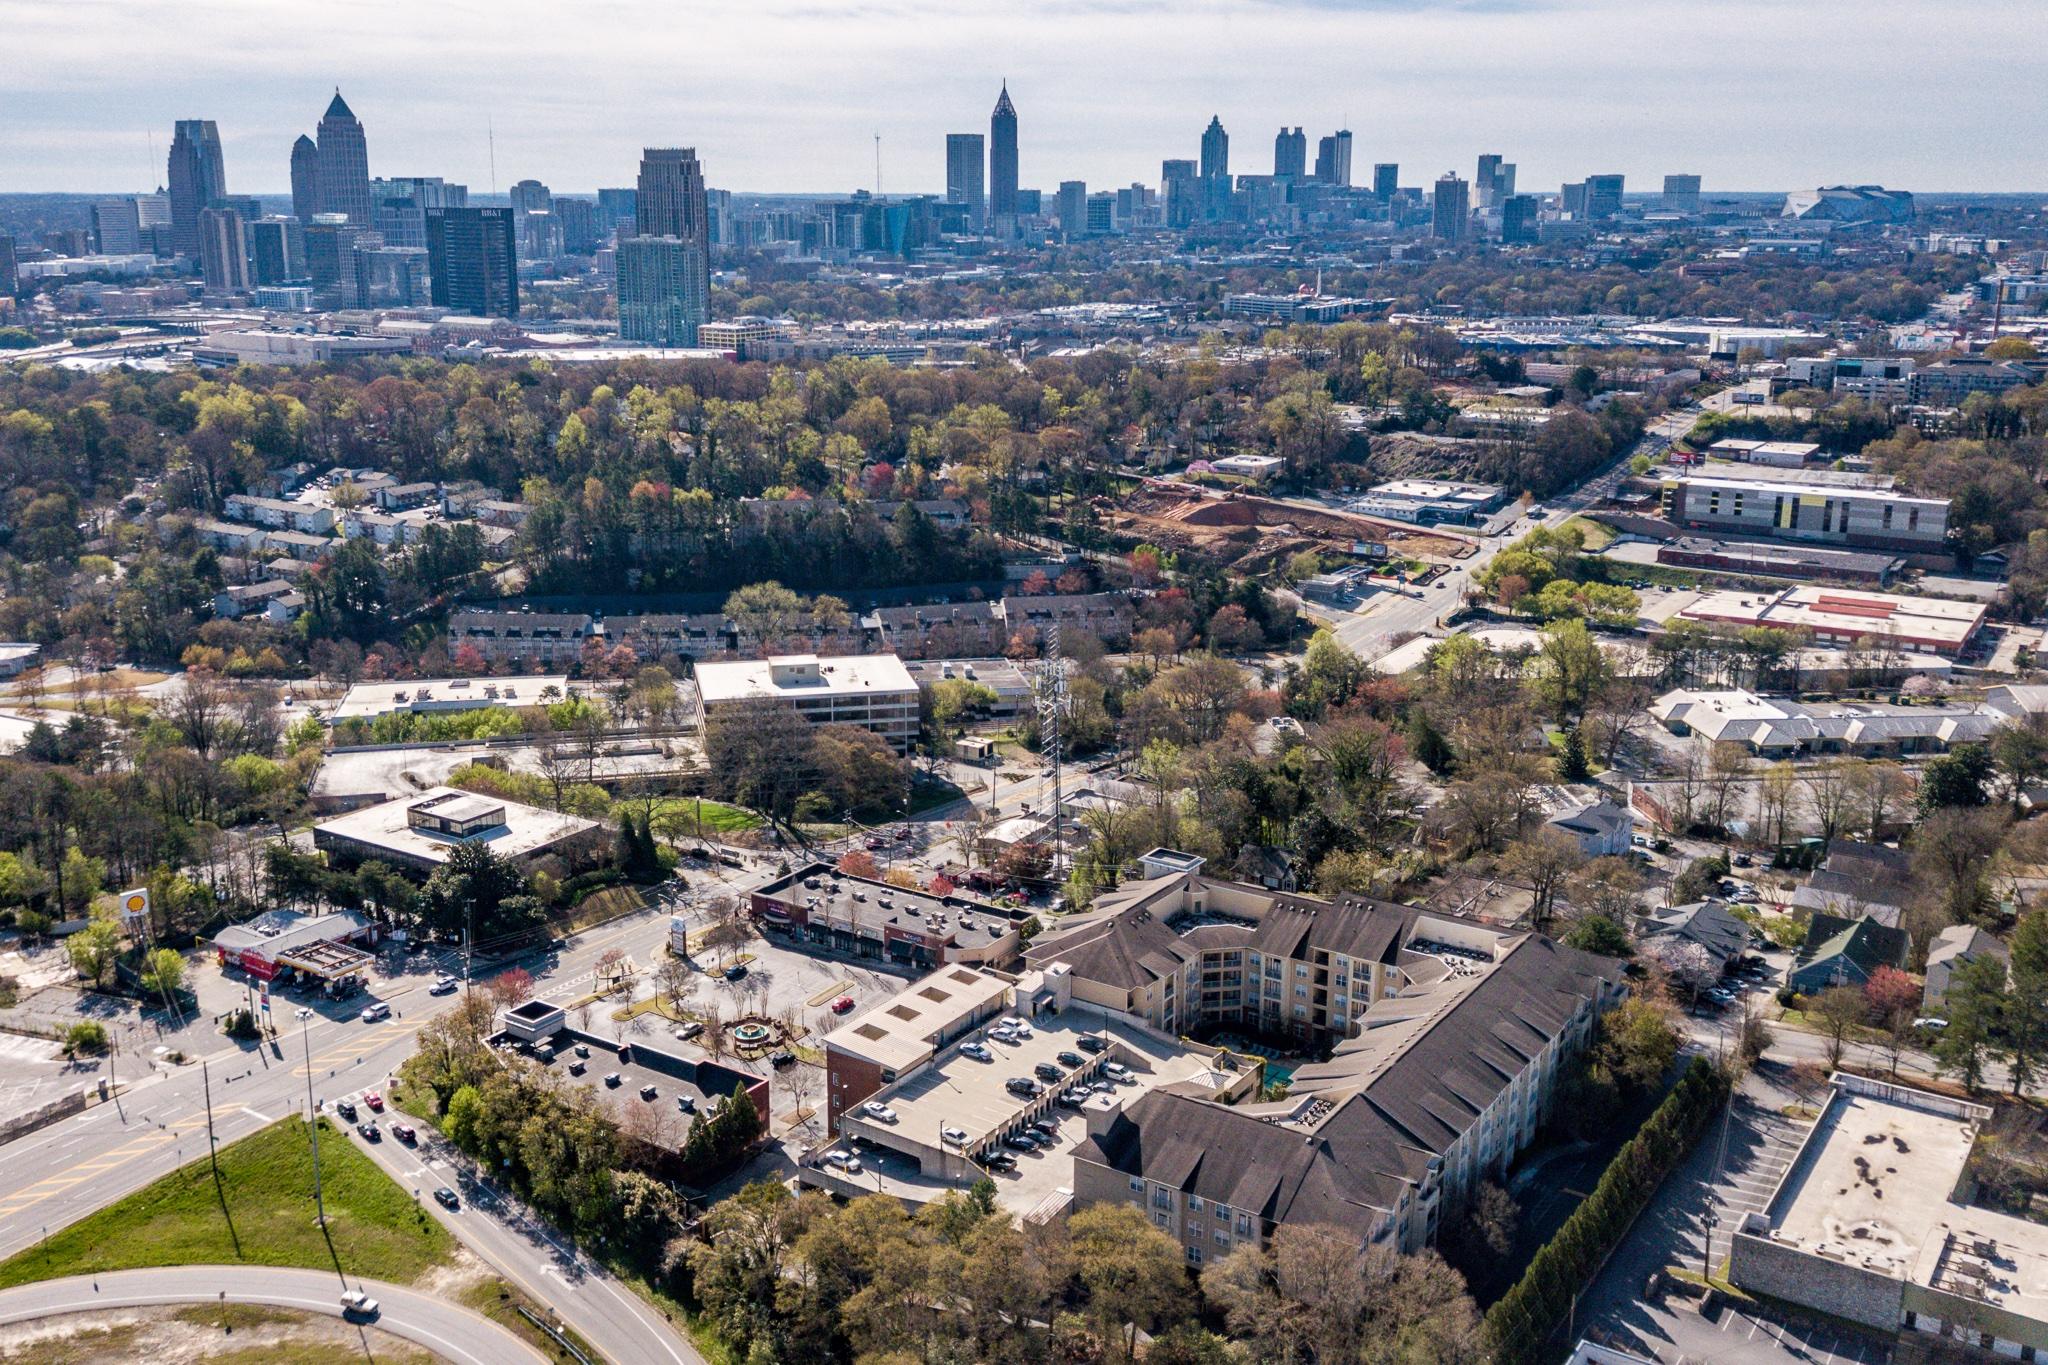 1700 Northside Drive Atlanta, GA 30318-6.jpg